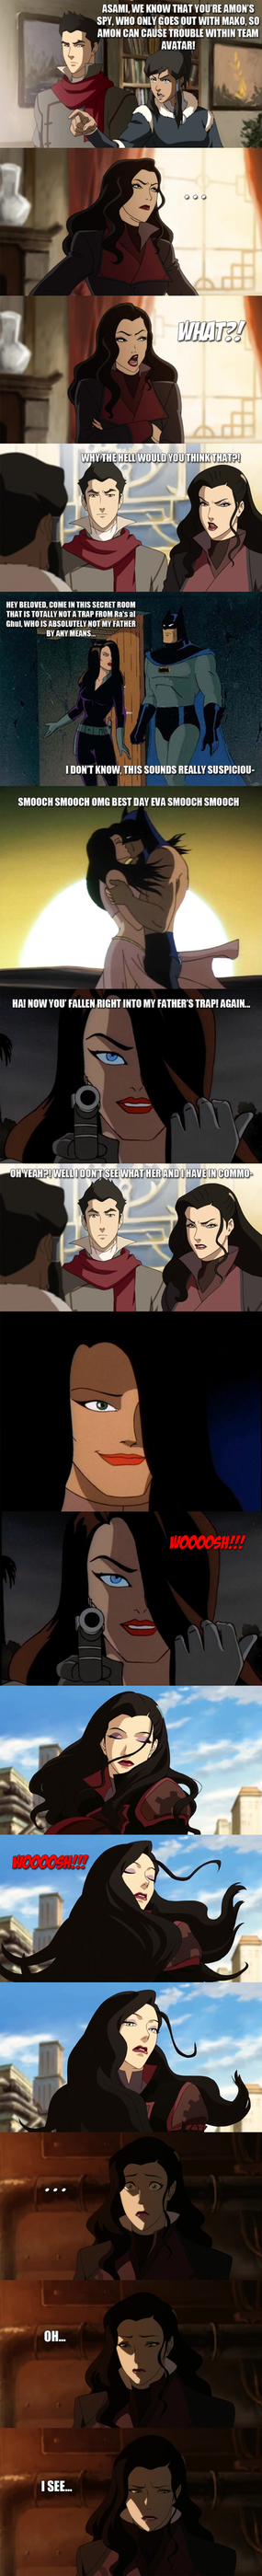 Legend of Korra - Asami, the spy... by yourparodies